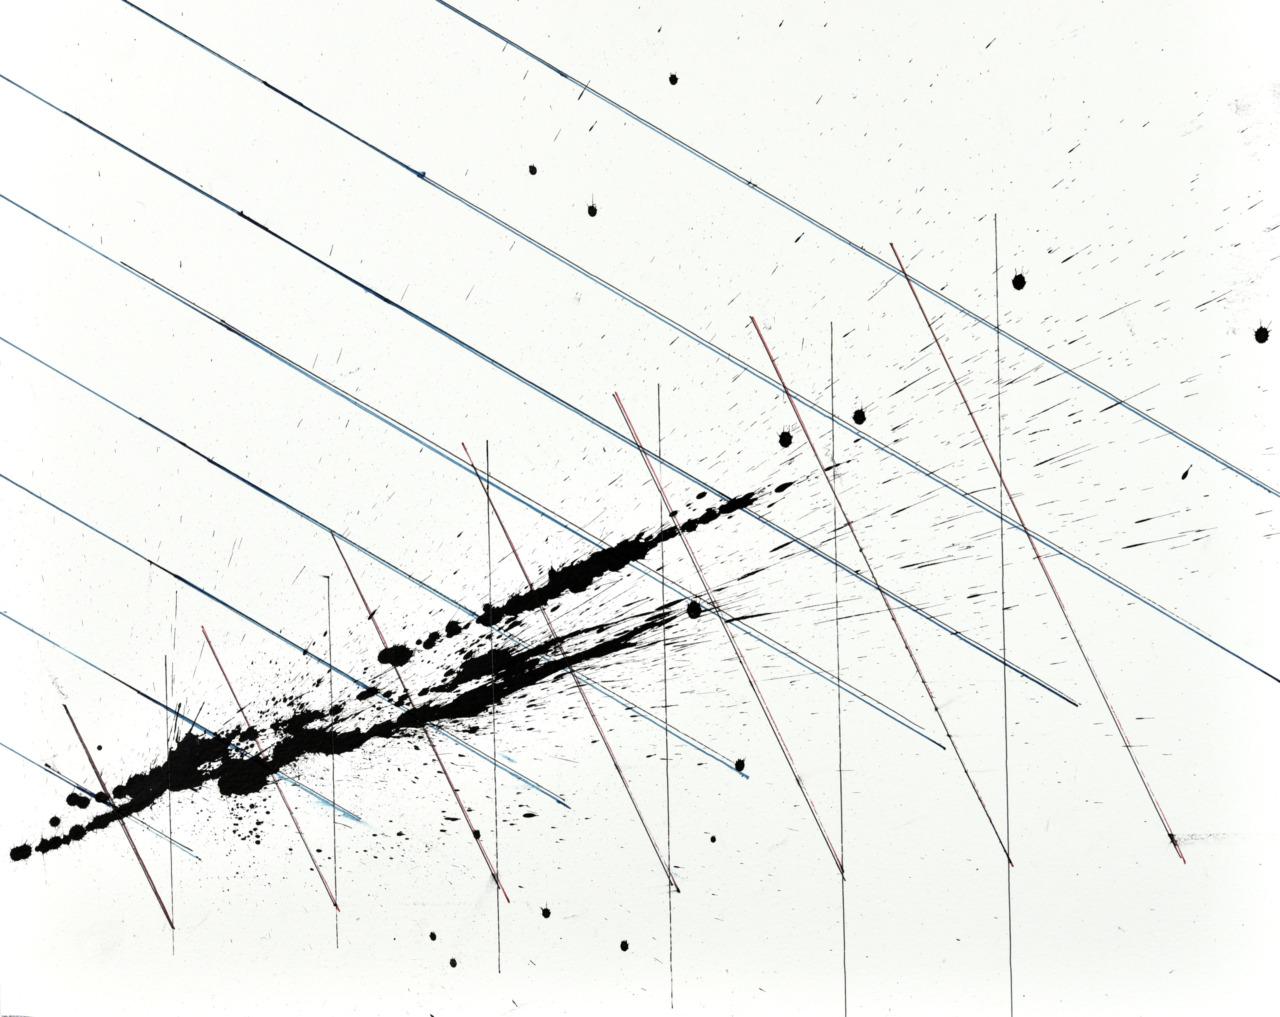 op140520. acrylic on paper 40x50cm